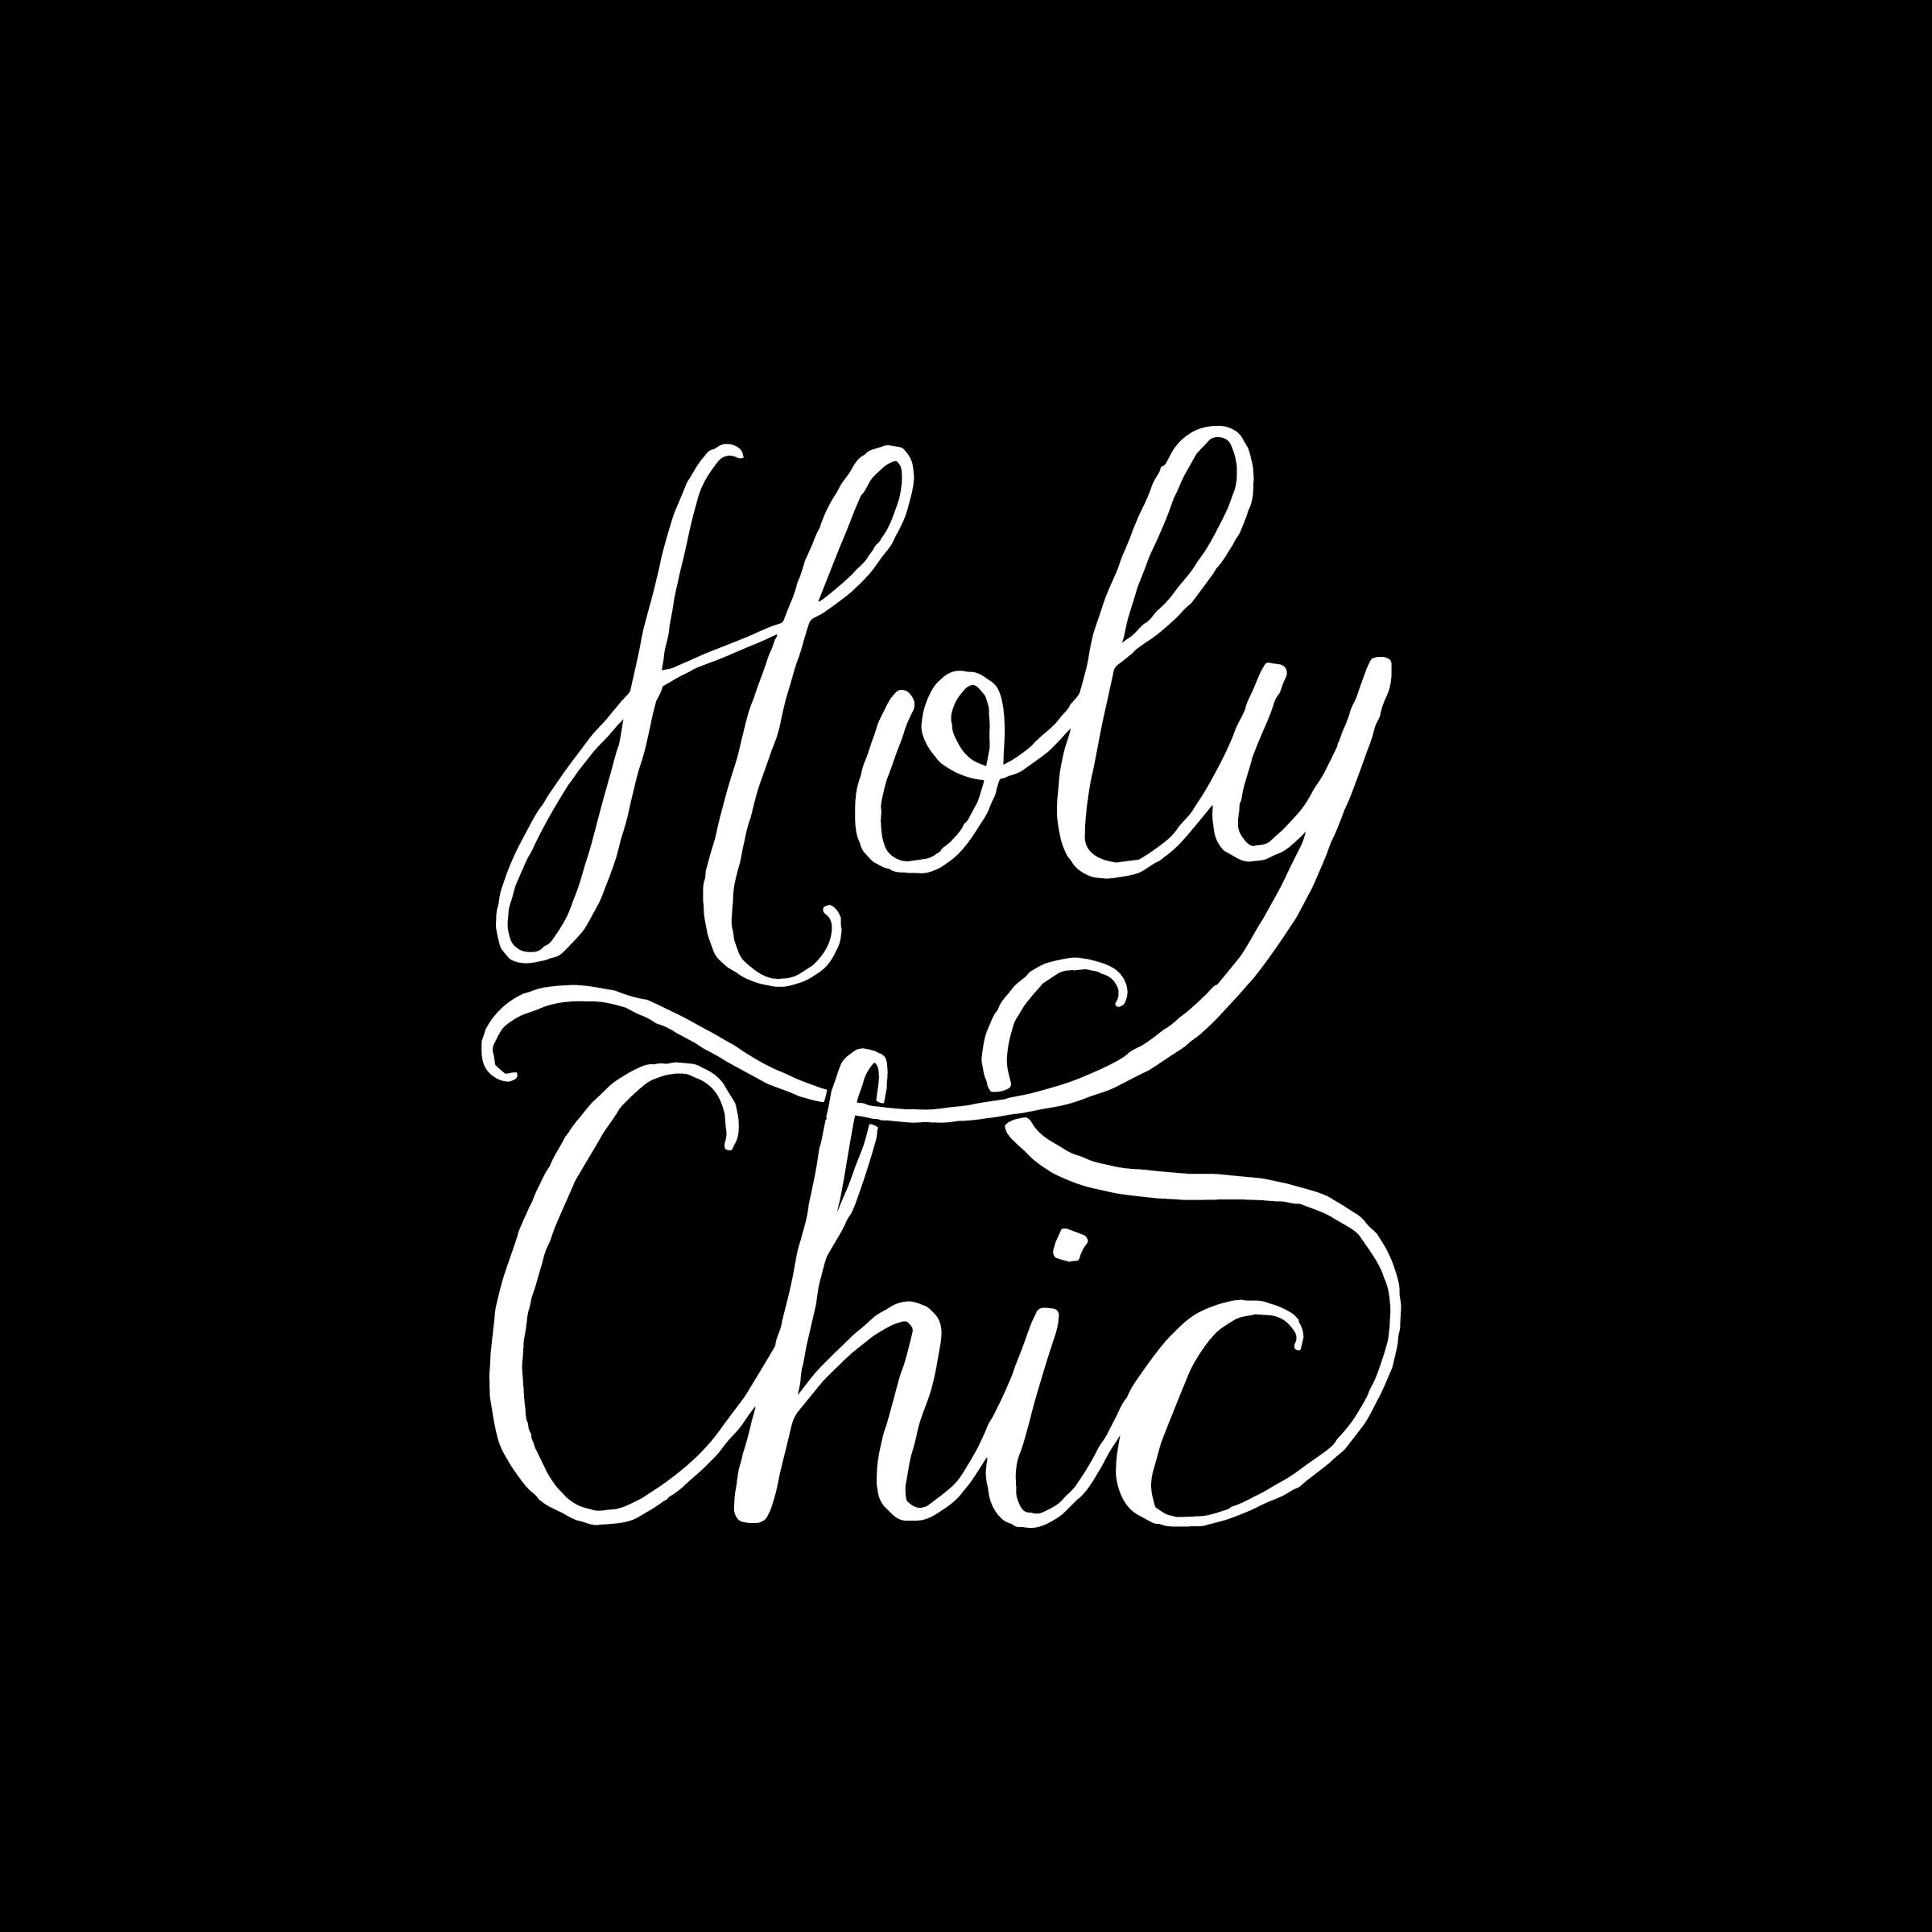 Holy Chic - andreacrofts.com.jpg